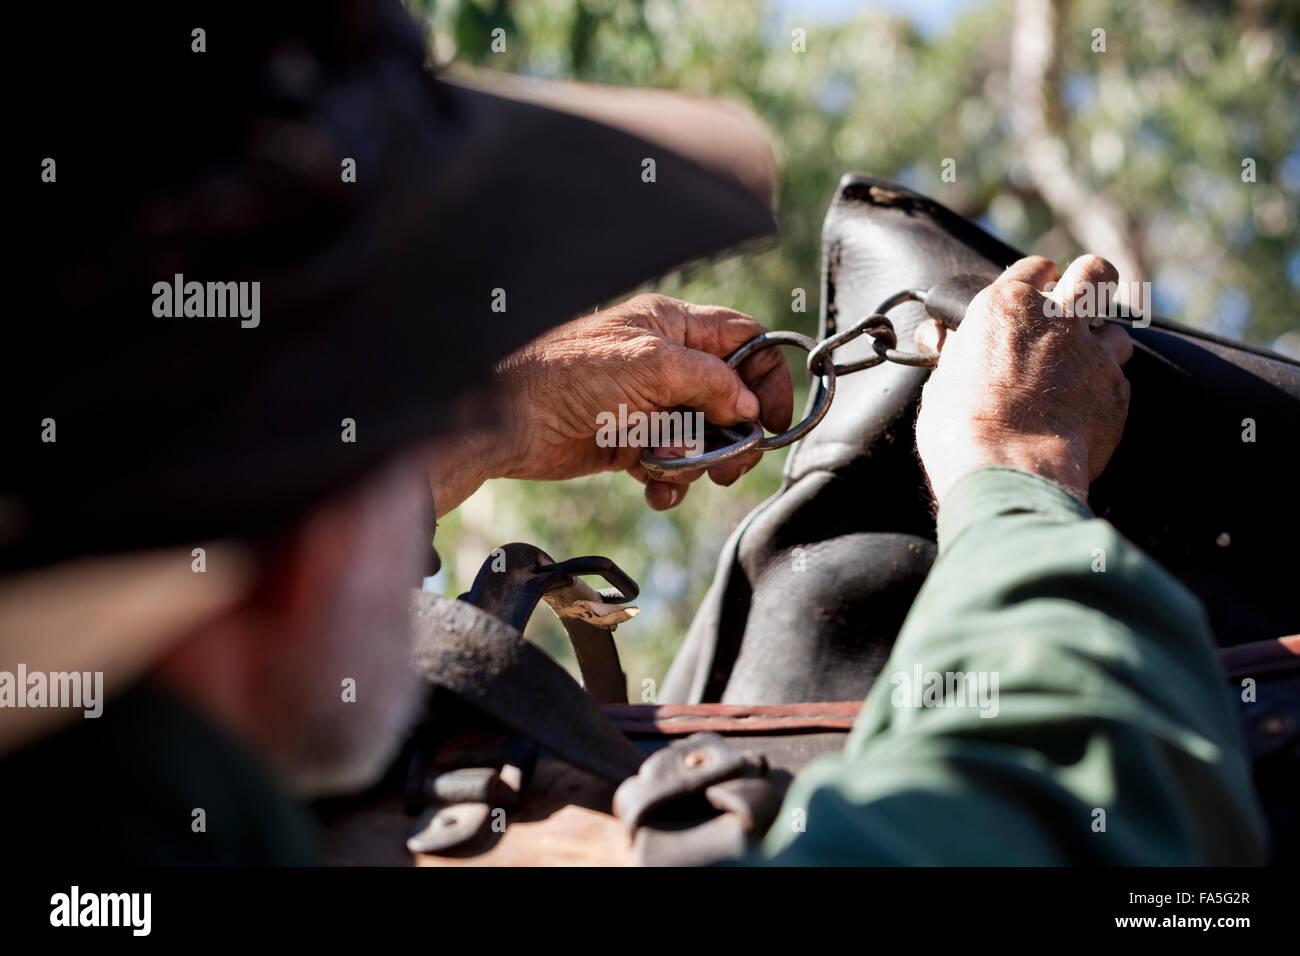 Fletch, an experienced Tasmanian horseman and staffer of Bogong Horseback Adventures, checks a packsaddle - Stock Image